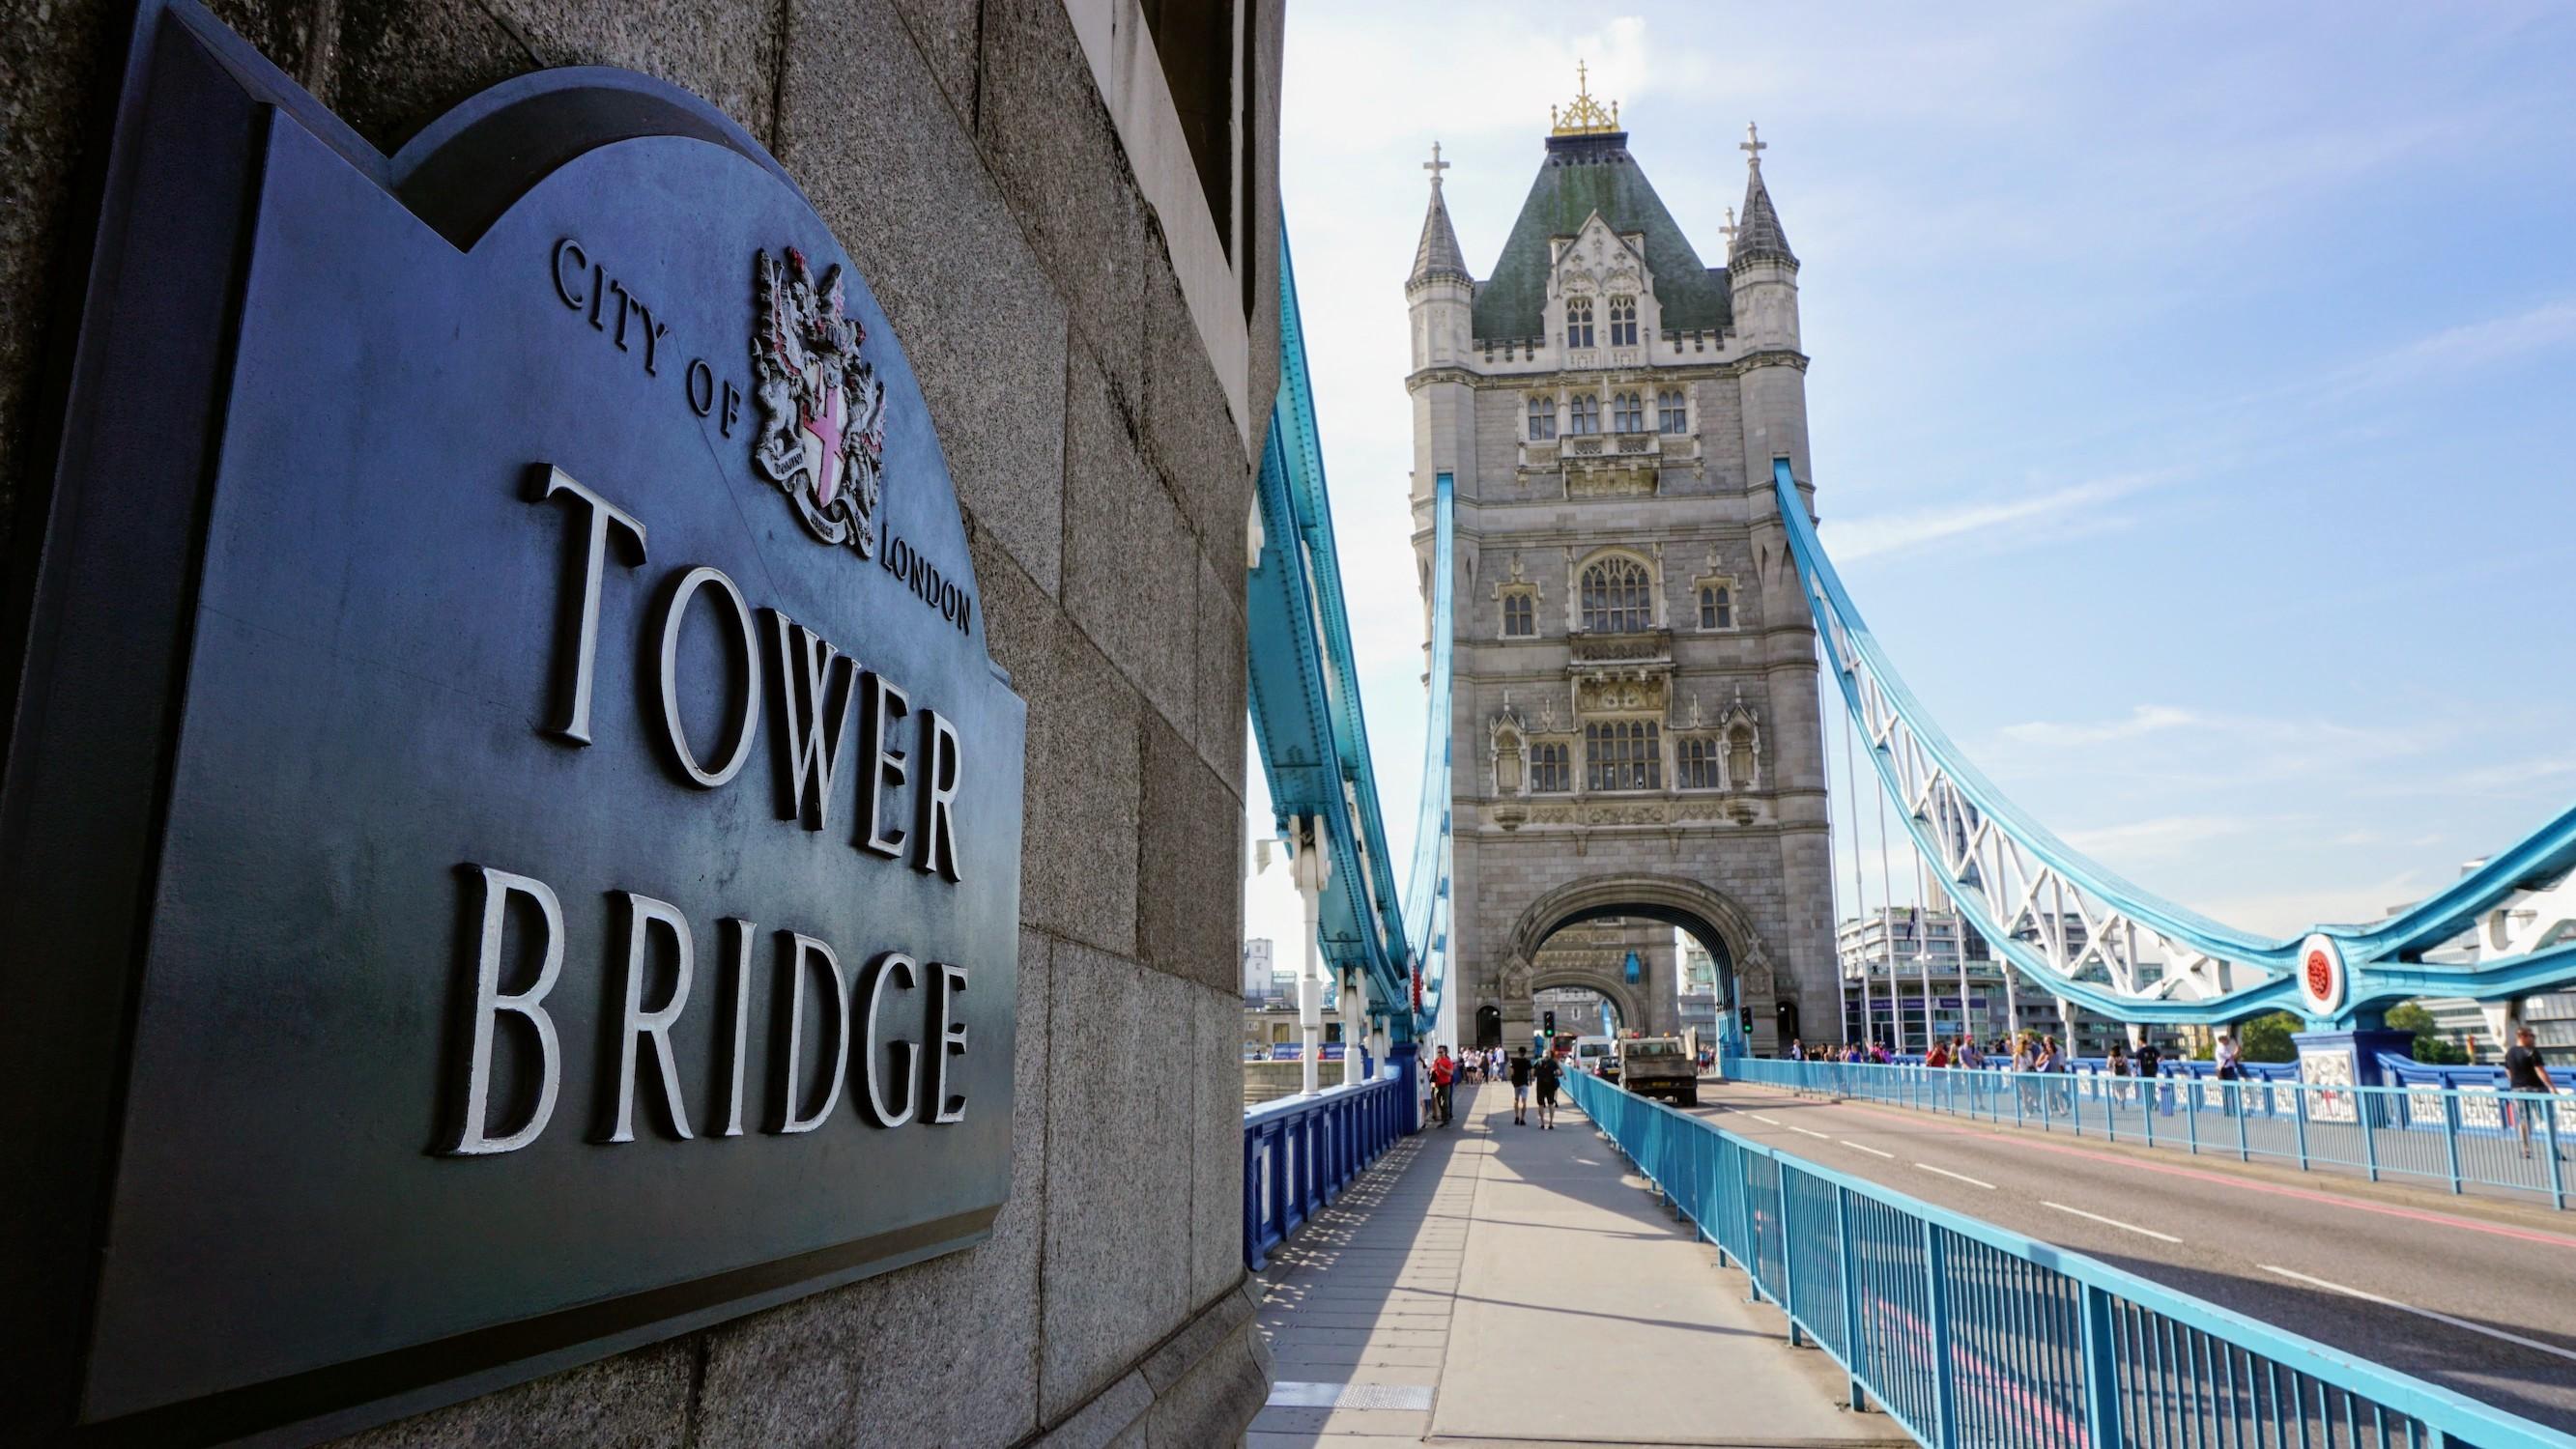 Tower Bridge (01)